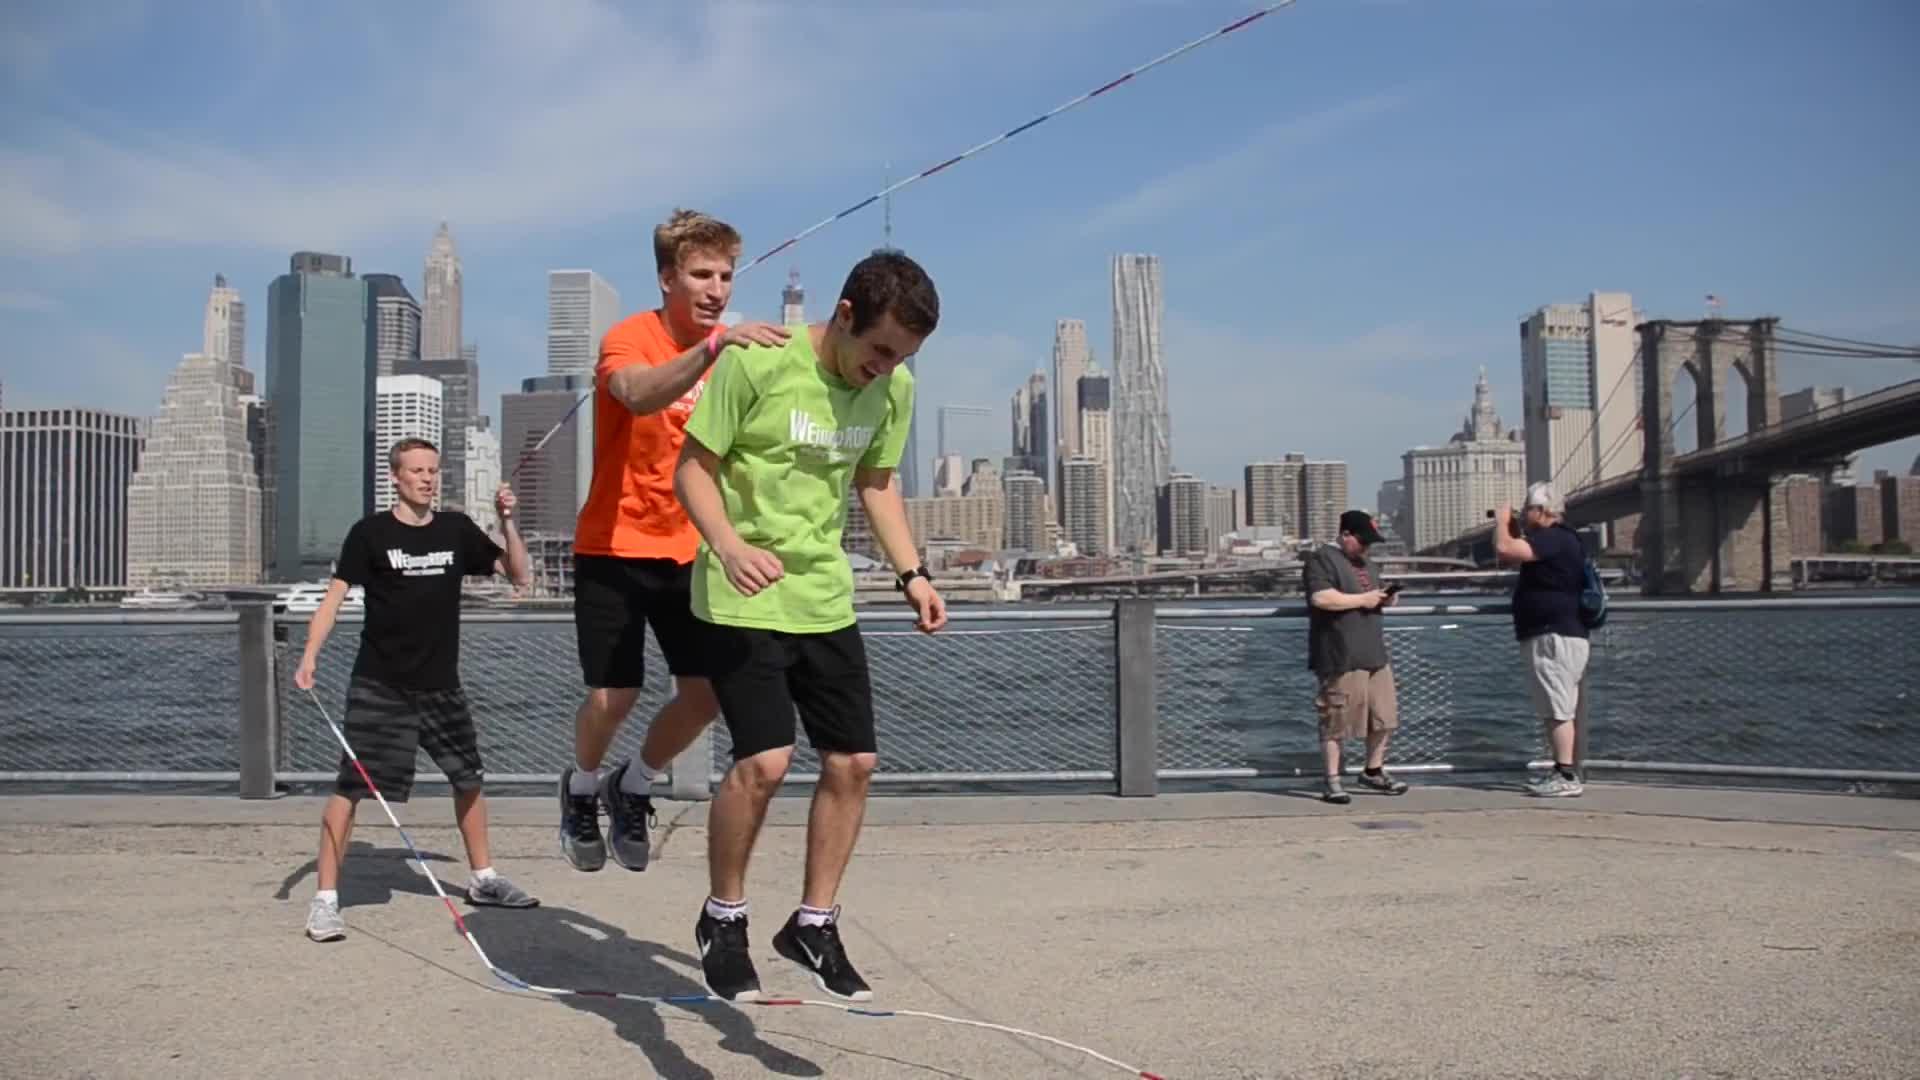 #athletic, #breakdance, #crossfit, #dance, #jump, #jumprope, #newyork, #newyorkcity, #rope, #wejumprope, New York City Jump Rope GIFs